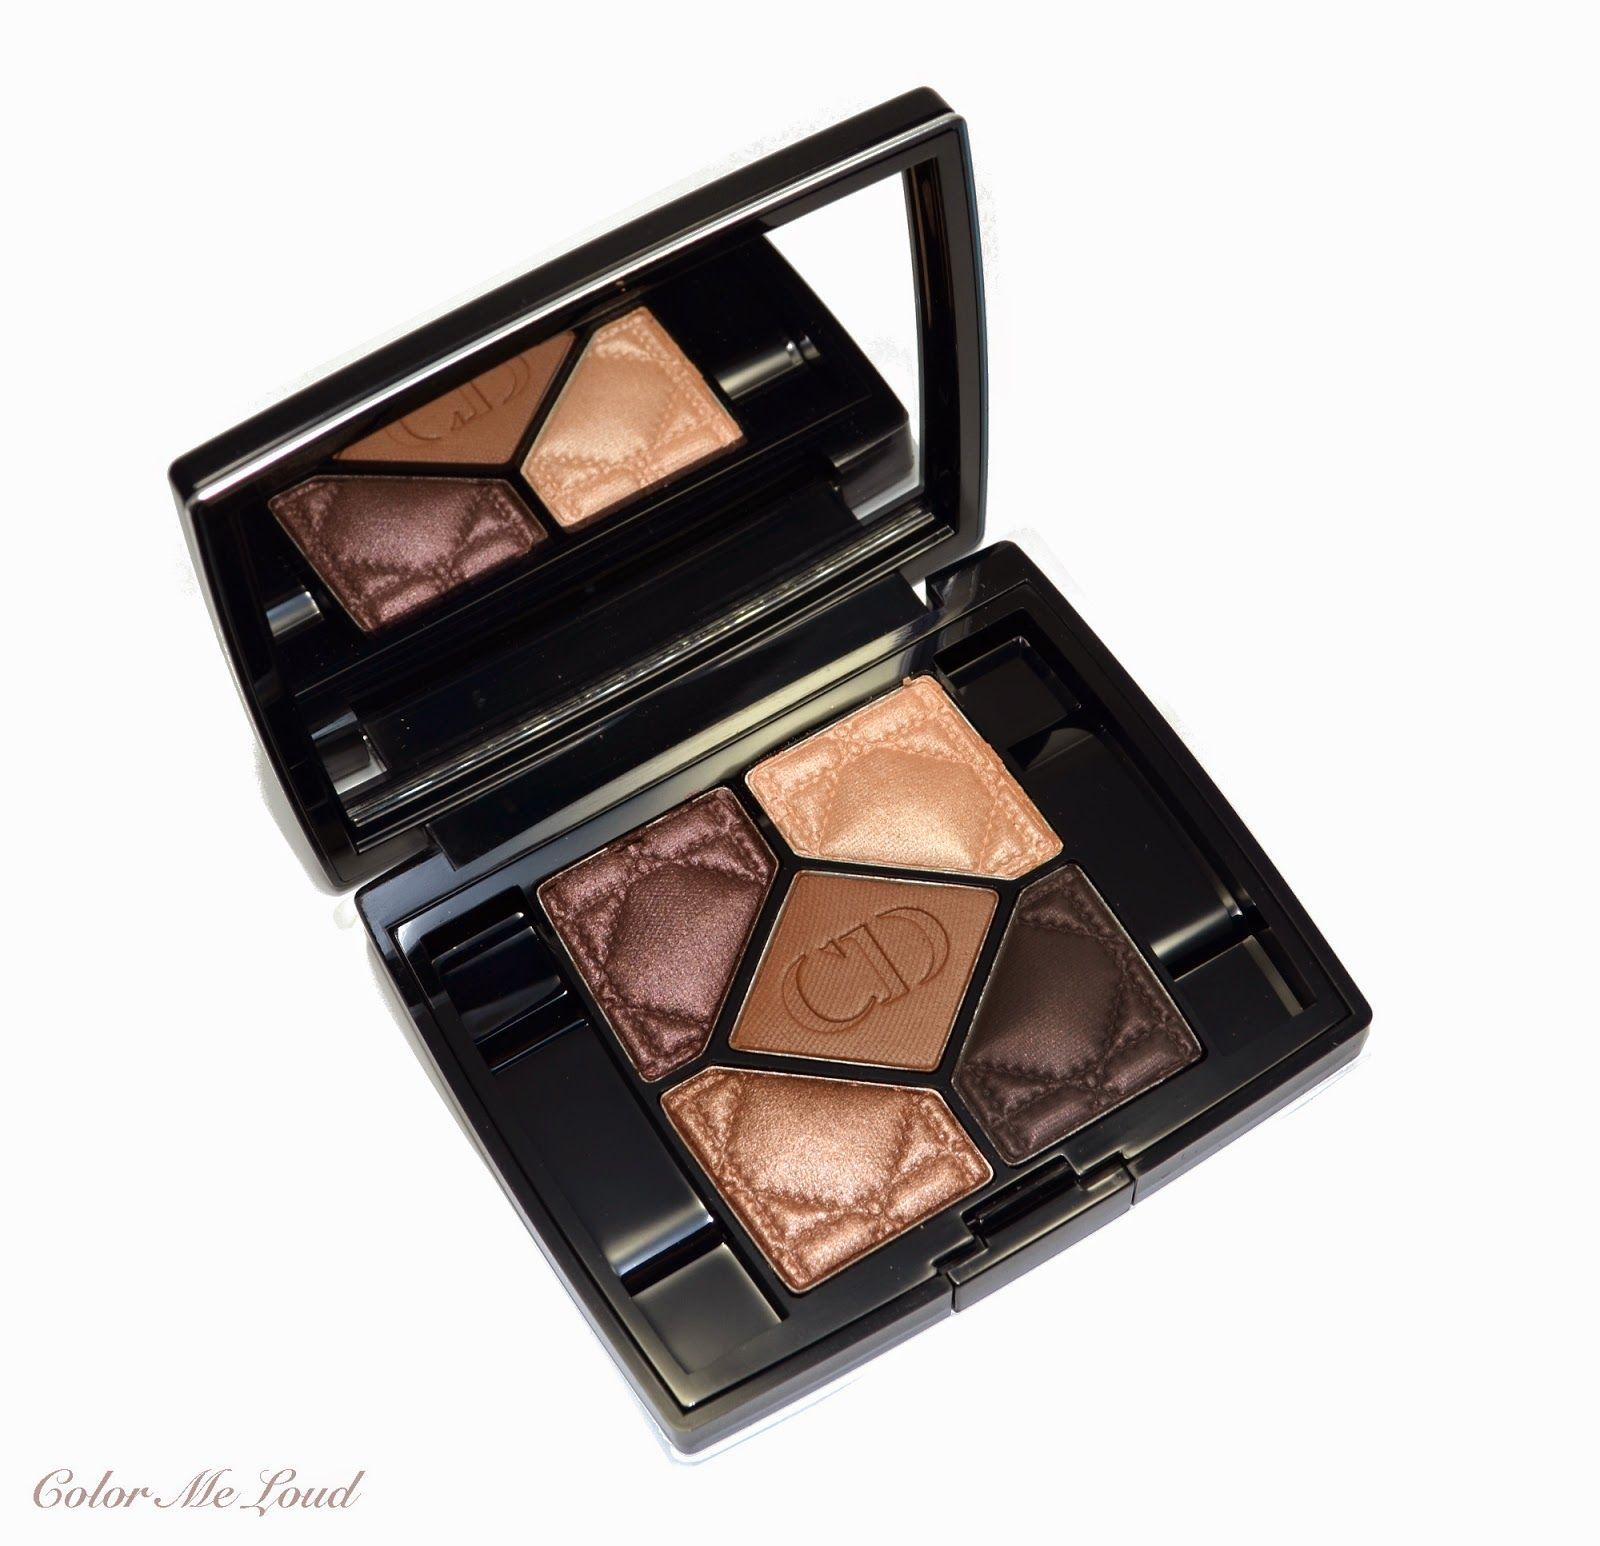 Dior 5 Couleurs Eye Shadow Palette 796 Cuir Cannage